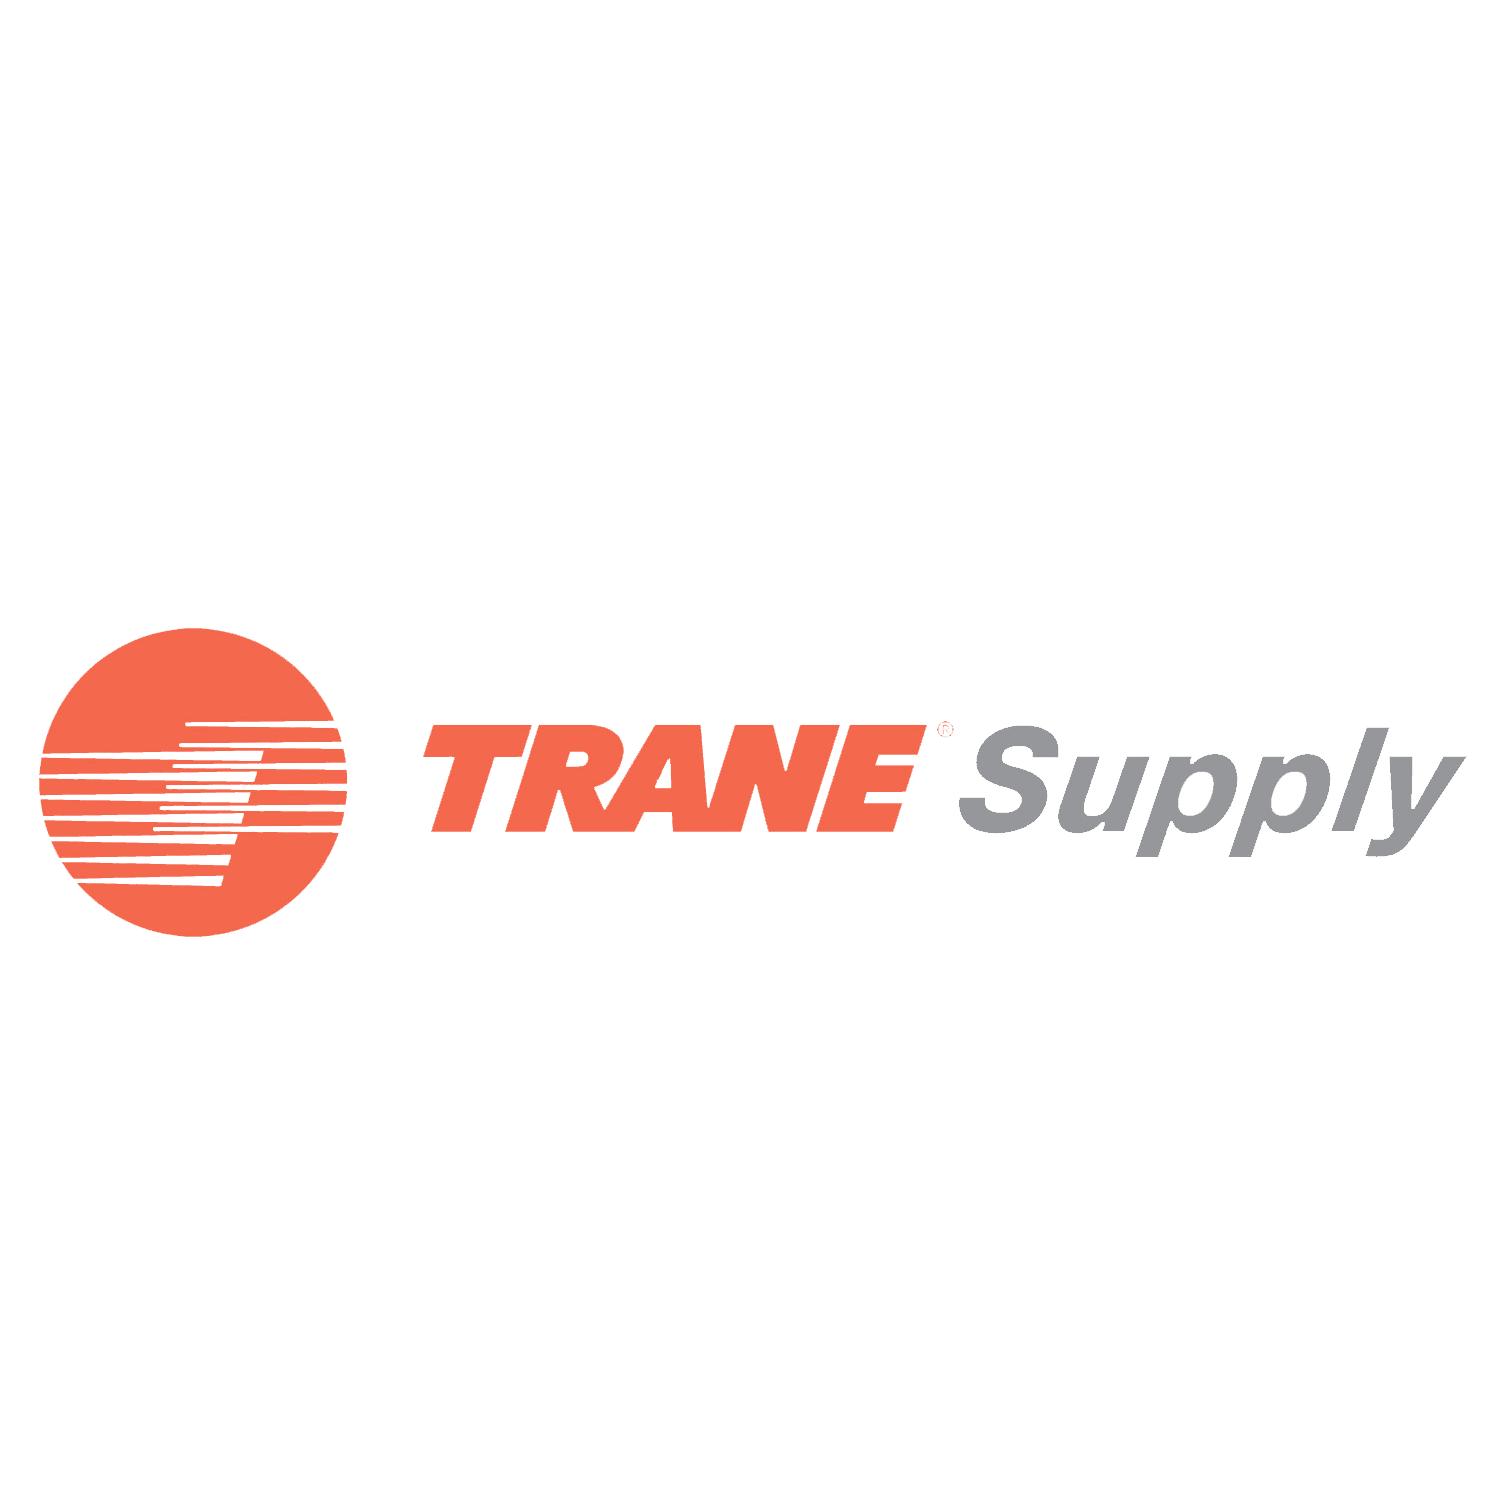 Trane Supply image 1